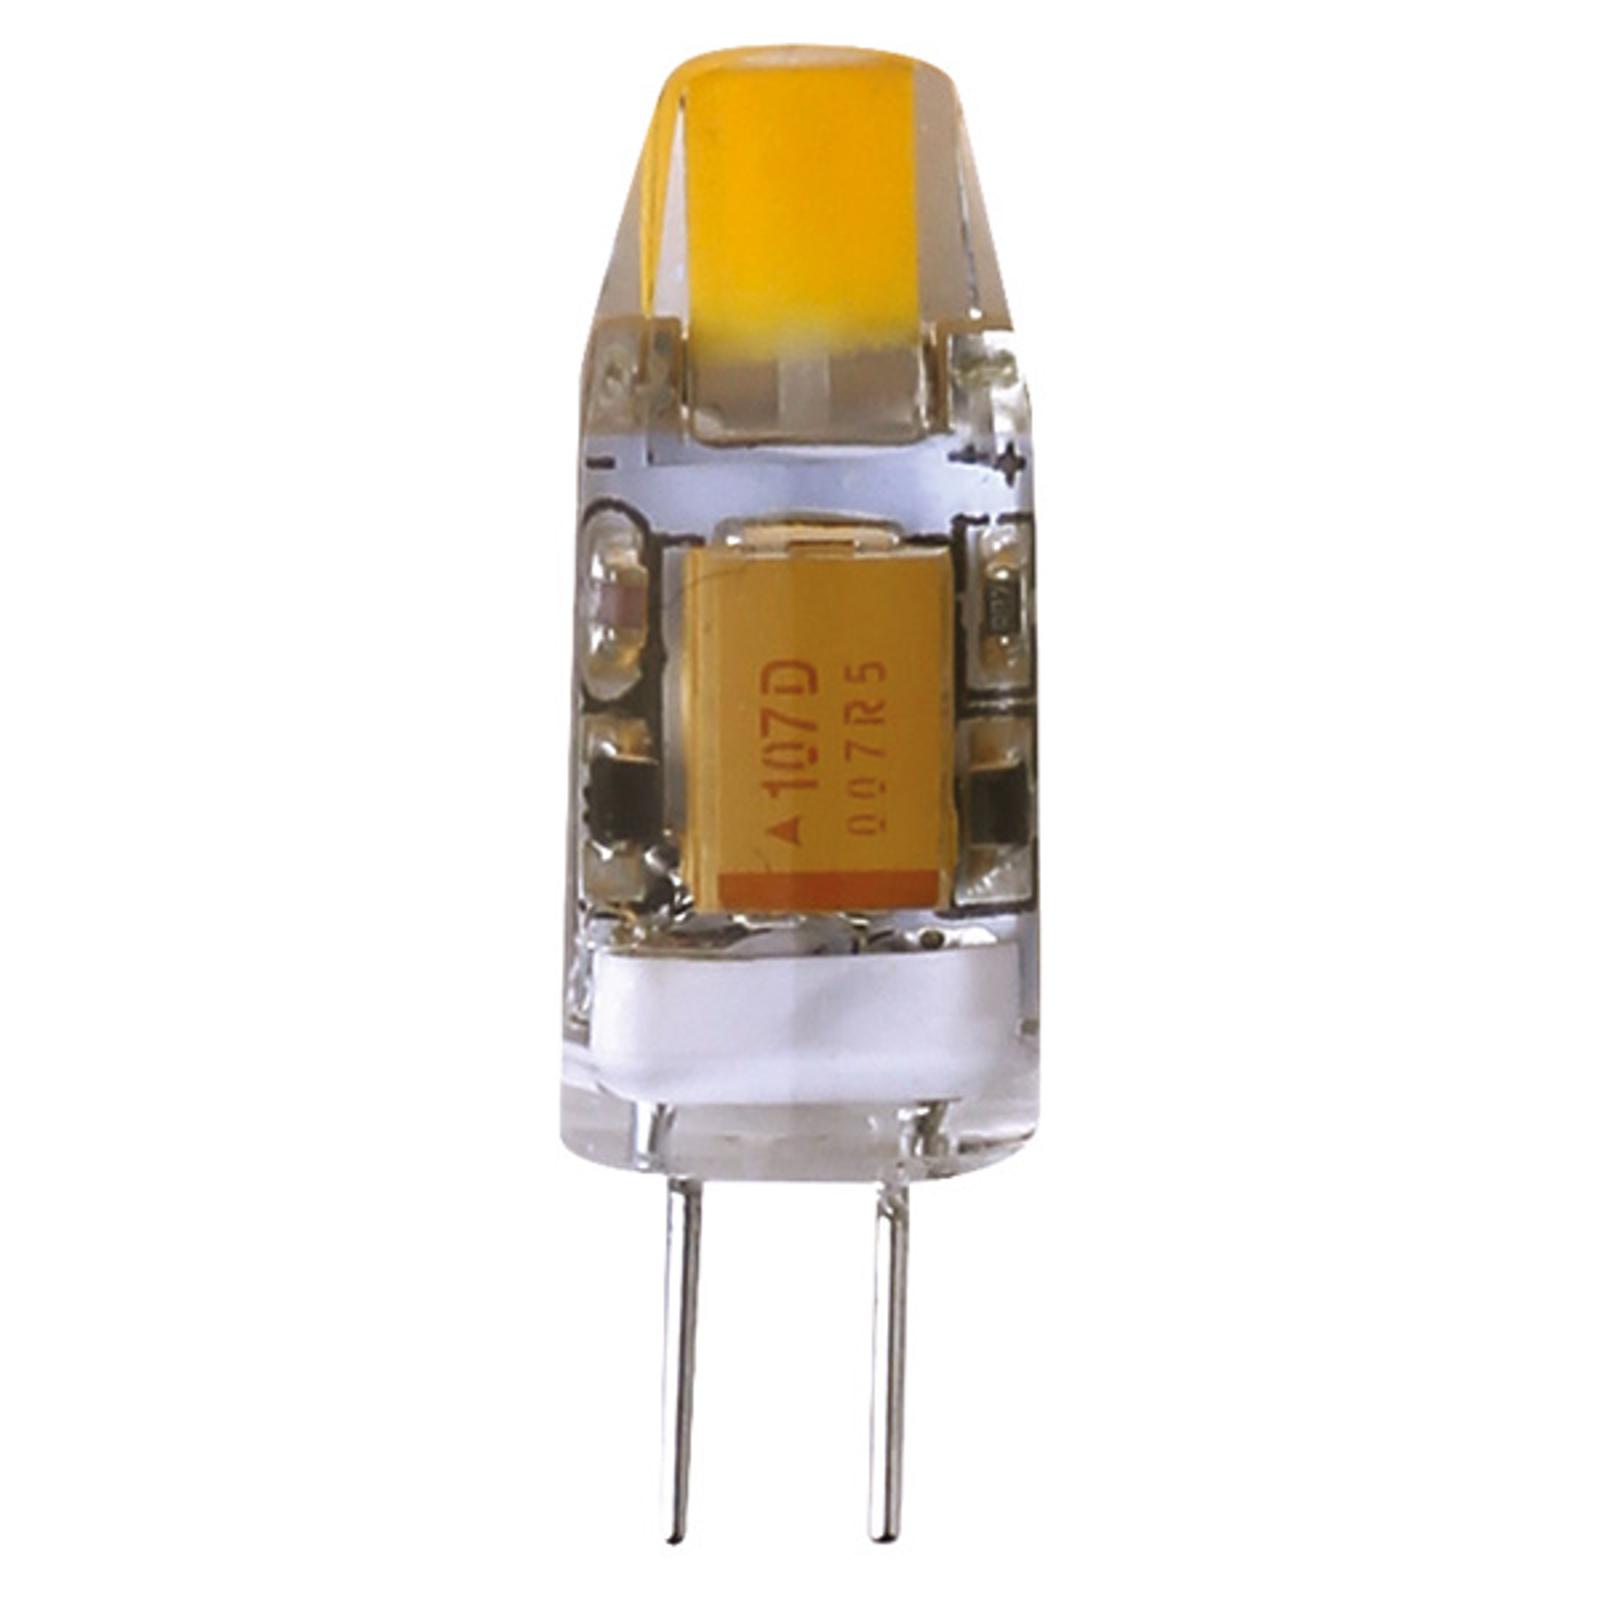 Lampadina con attacco a spina LED 828 1,2W G4